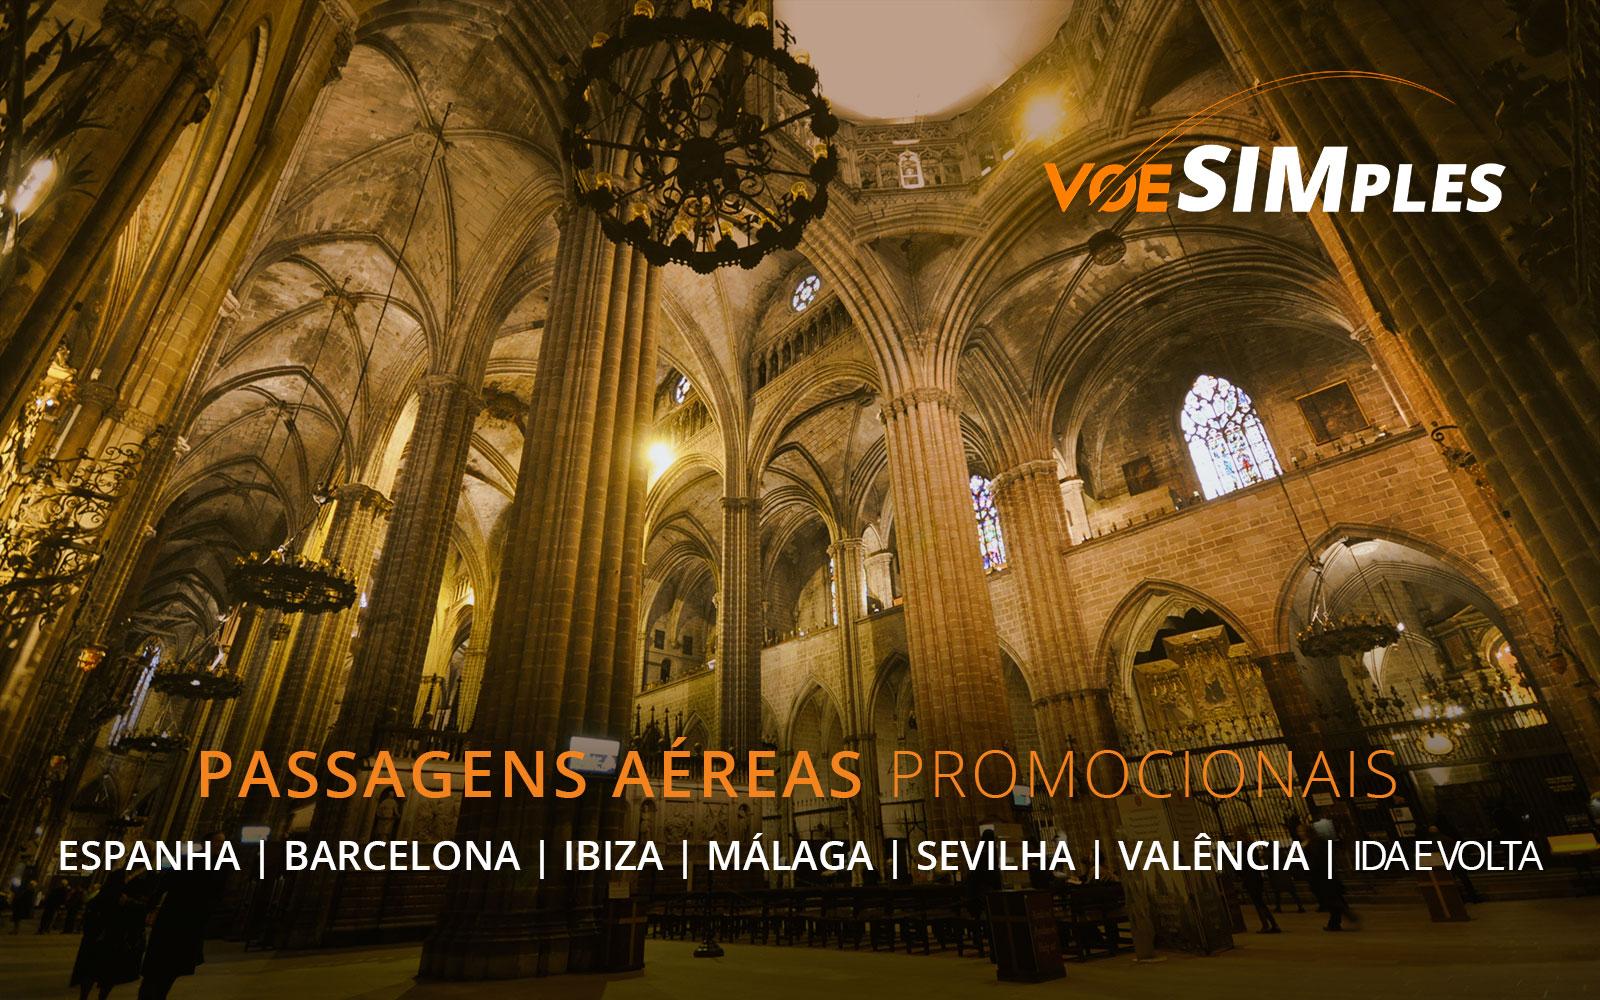 passagens-aereas-promocionais-espanha-barcelona-madri-ibiza-malaga-sevilha-valencia-voe-simples-passagens-aereas-baratas-promocao-espanha